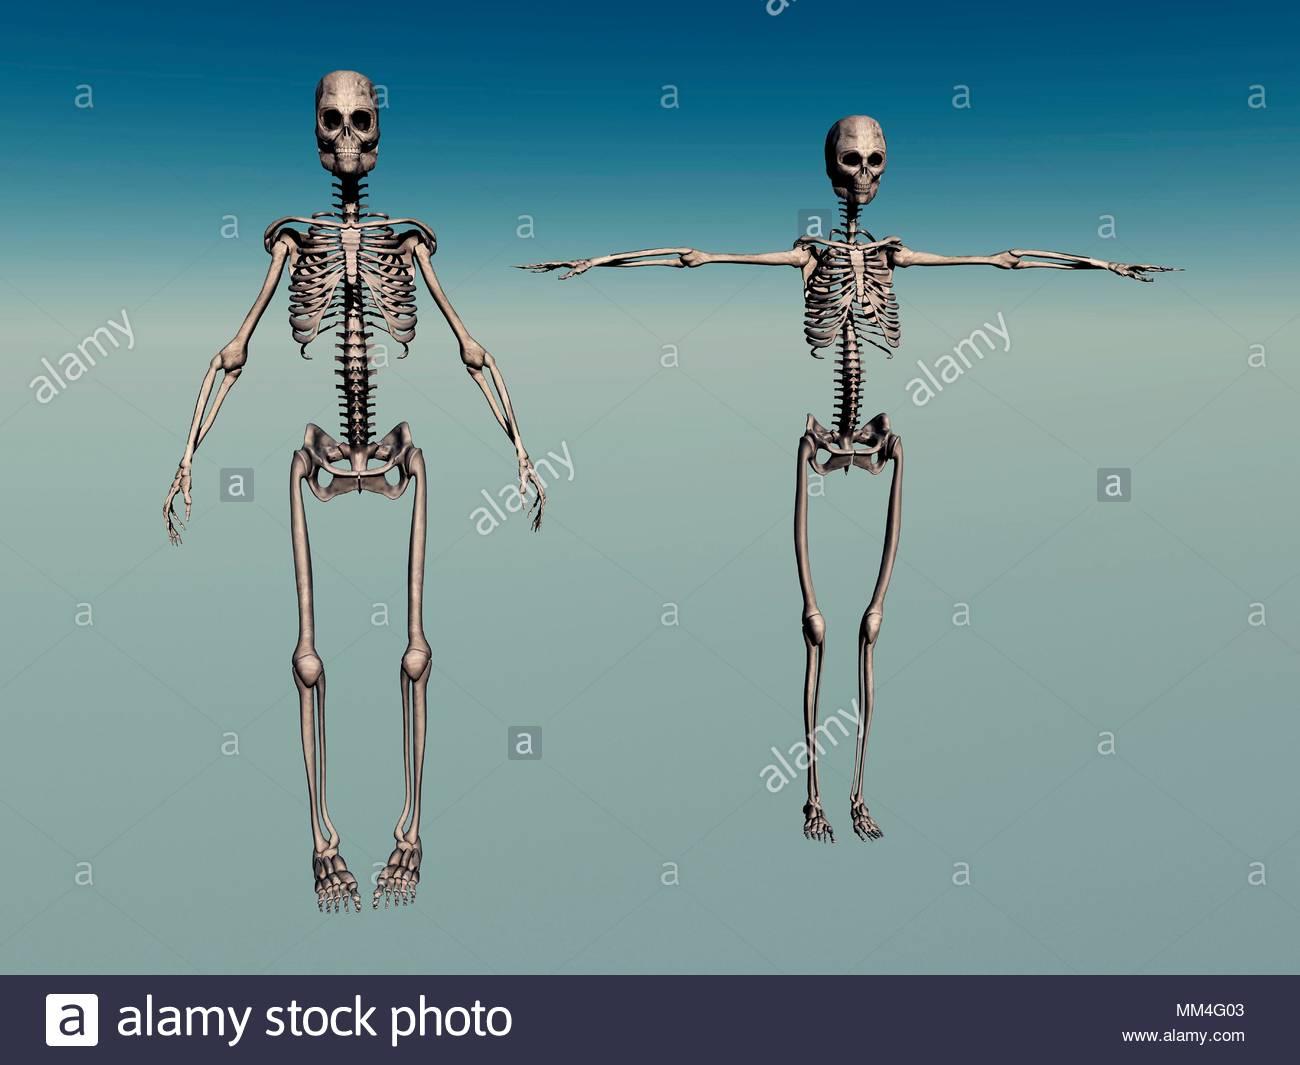 Male & Female Human Skeletons Stock Photo: 184497155 - Alamy